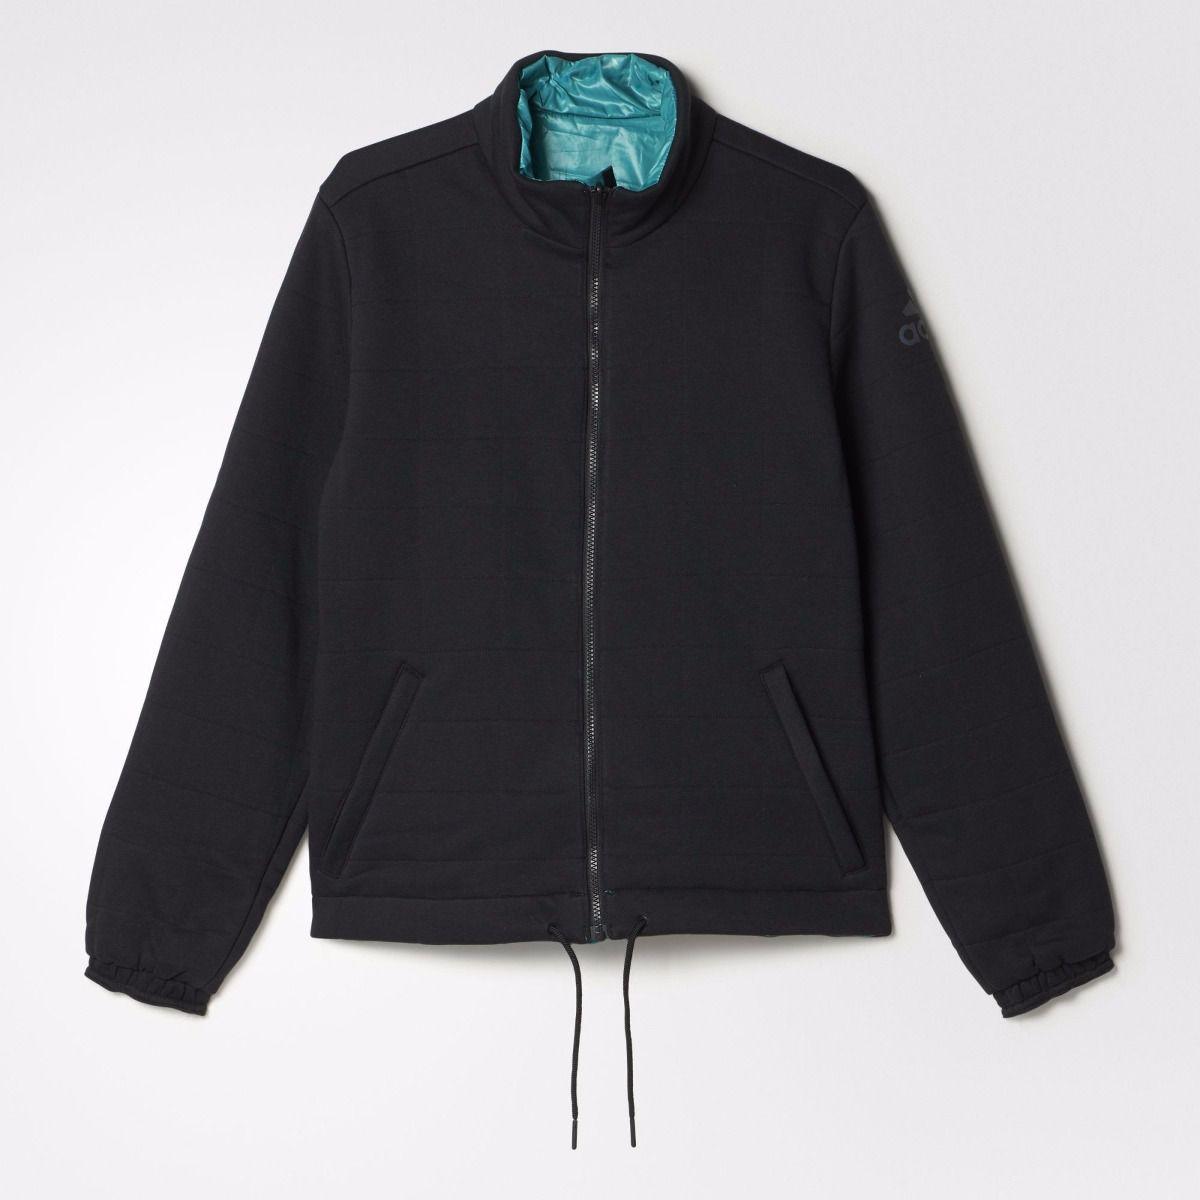 1102ec4c5bd8b produto jaqueta umbro twr ultra light - Busca na Sportland